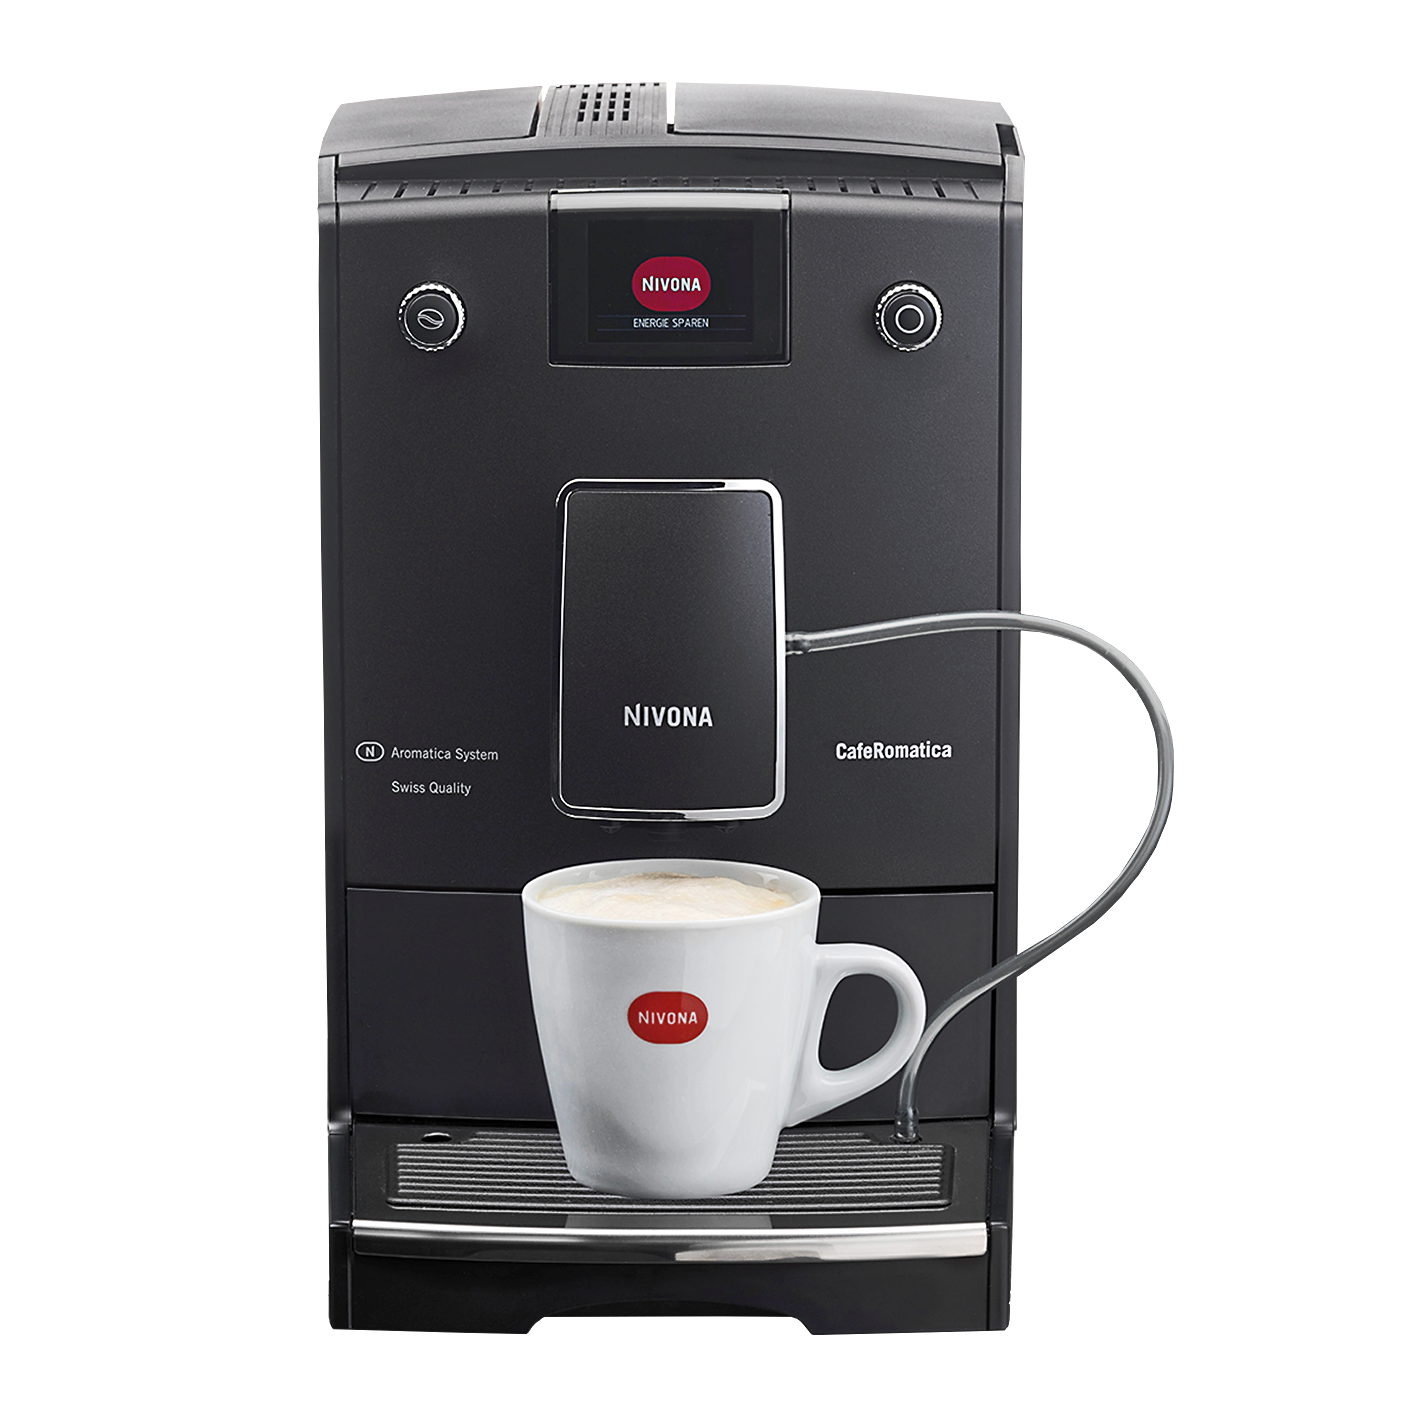 Vorschau: NIVONA CafeRomatica Serie 7 Kaffeevollautomat bei MIOMONDO